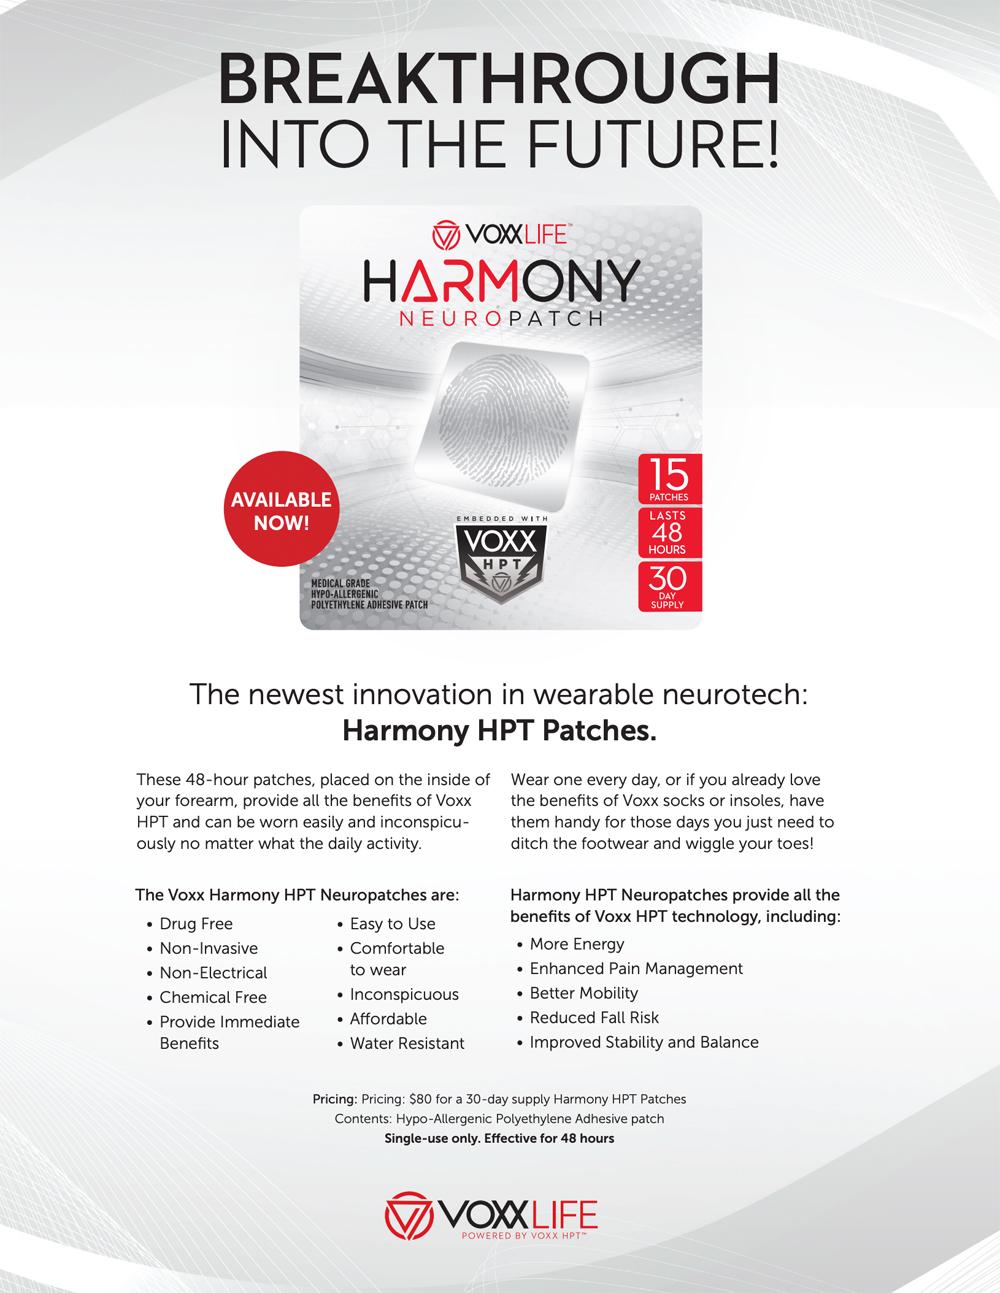 Voxxlife | Harmony Neuro Patch | Info sheet